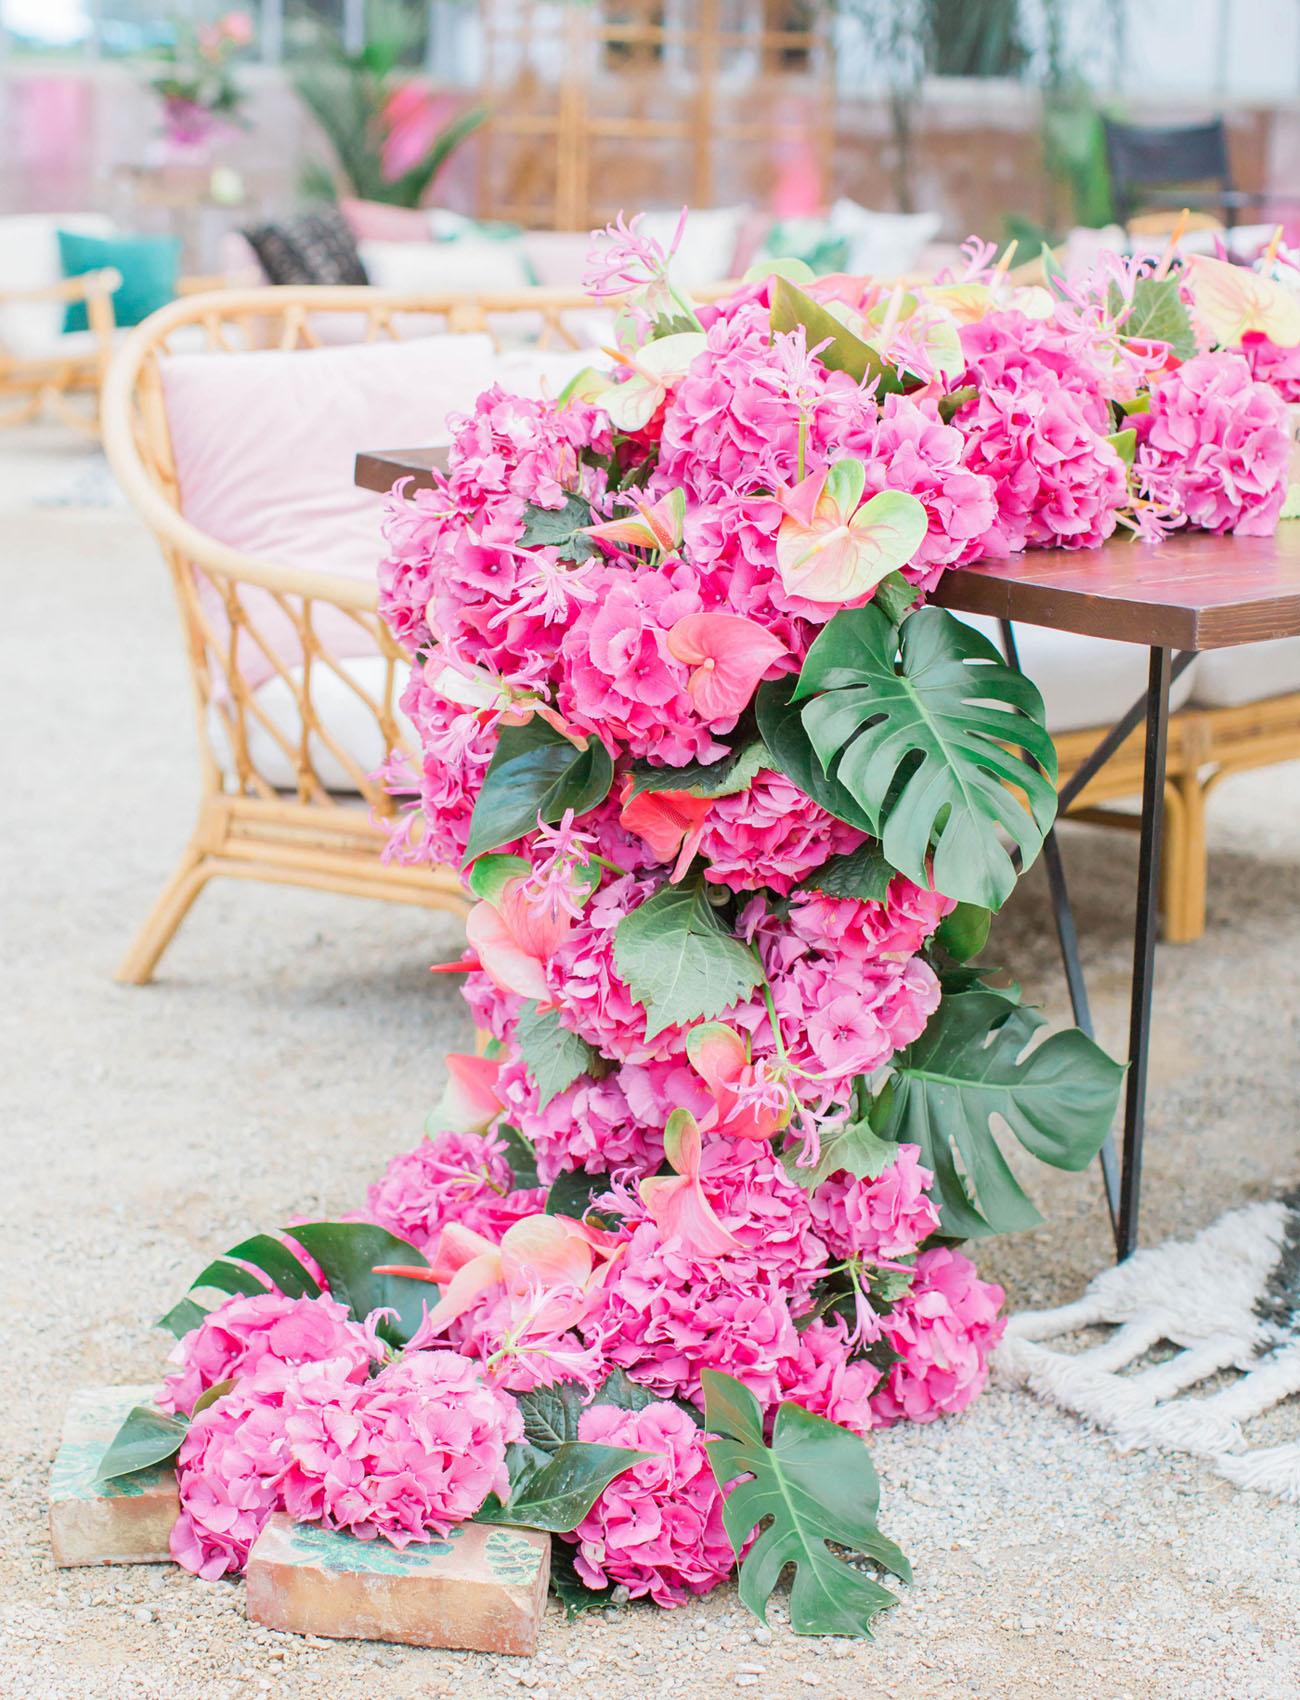 K'Mich Weddings - wedding planning - centerpiece alternatives - floral runner - green wedding shoes